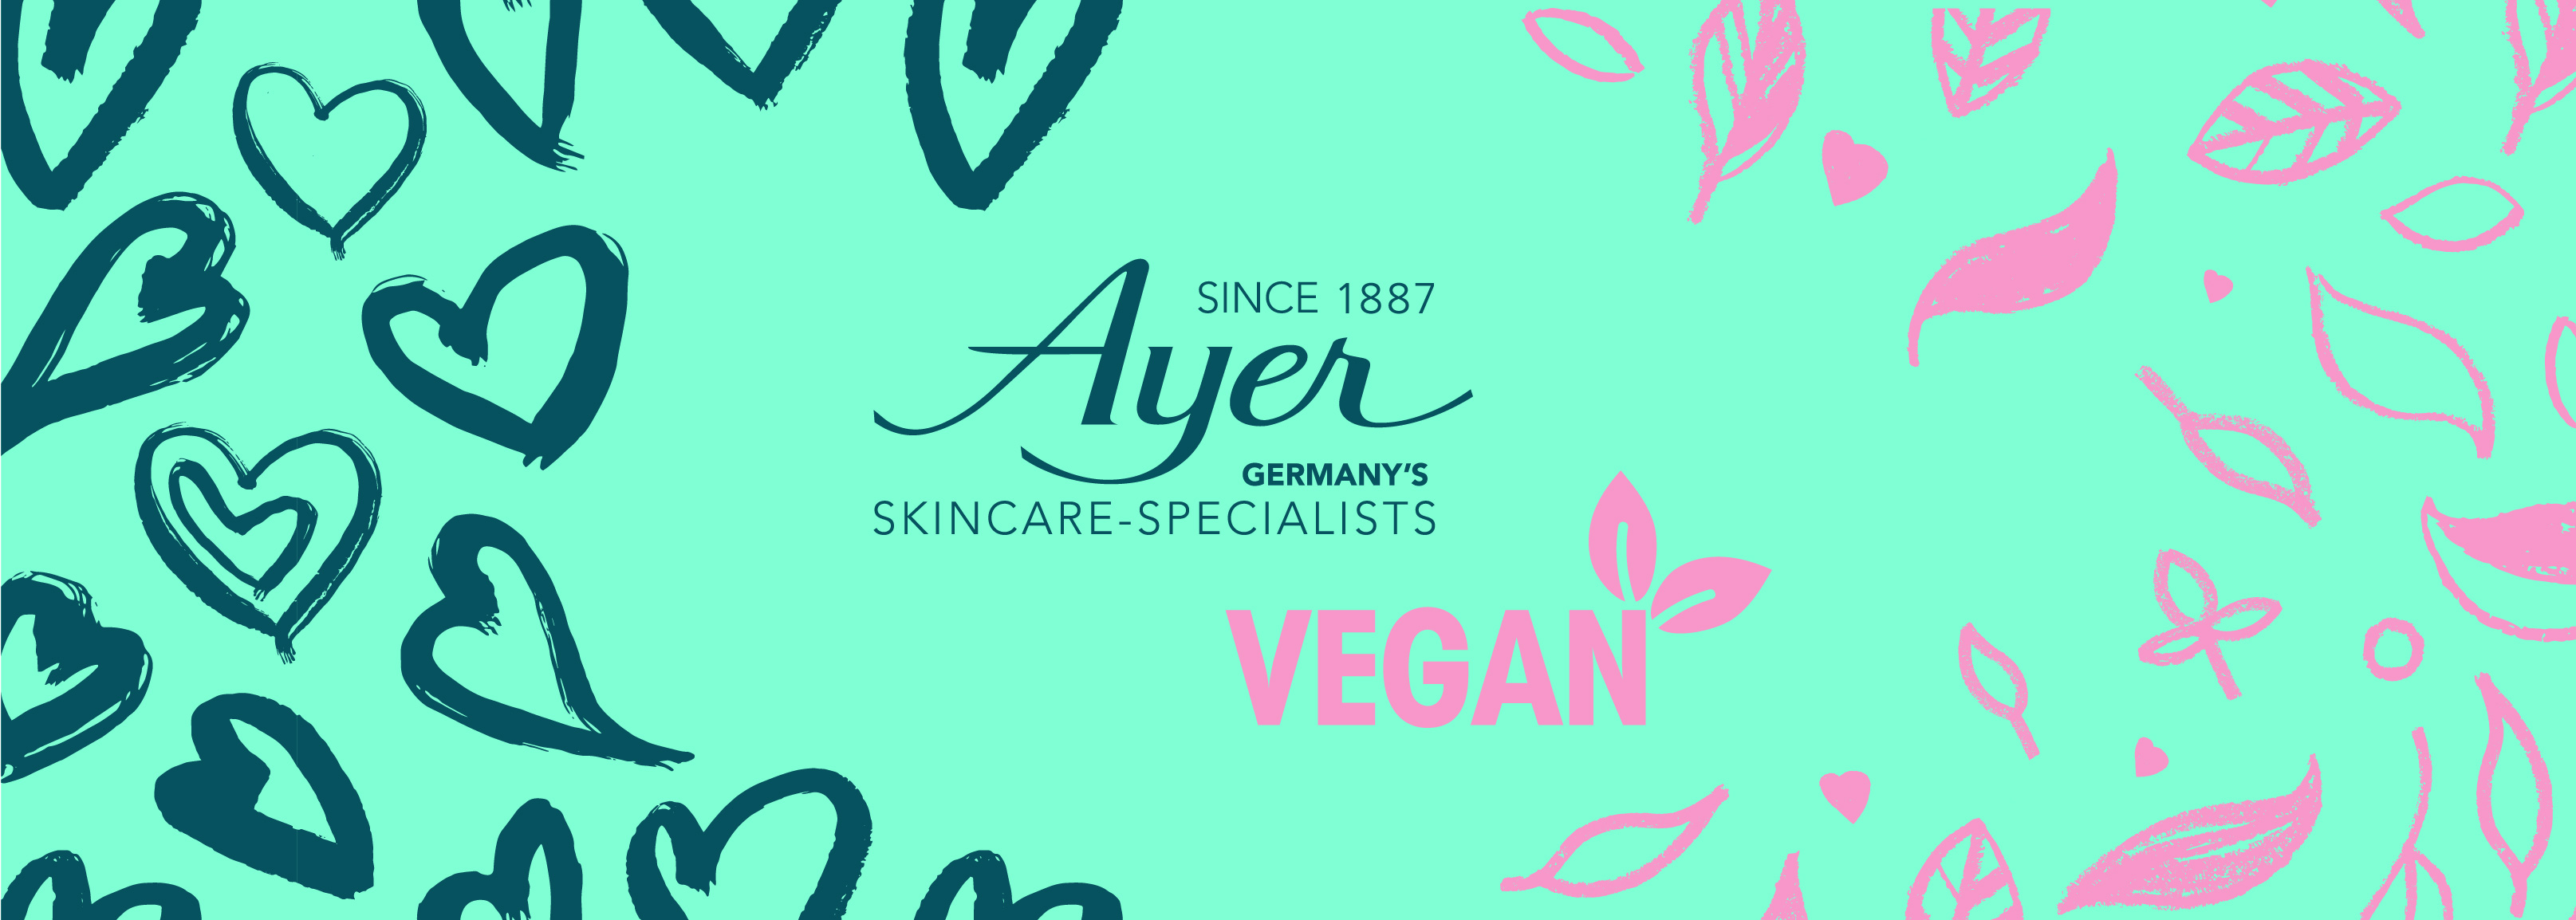 Ayer_Linien_Vegan_Slider_FR_2500x893px_RGB_V1-0